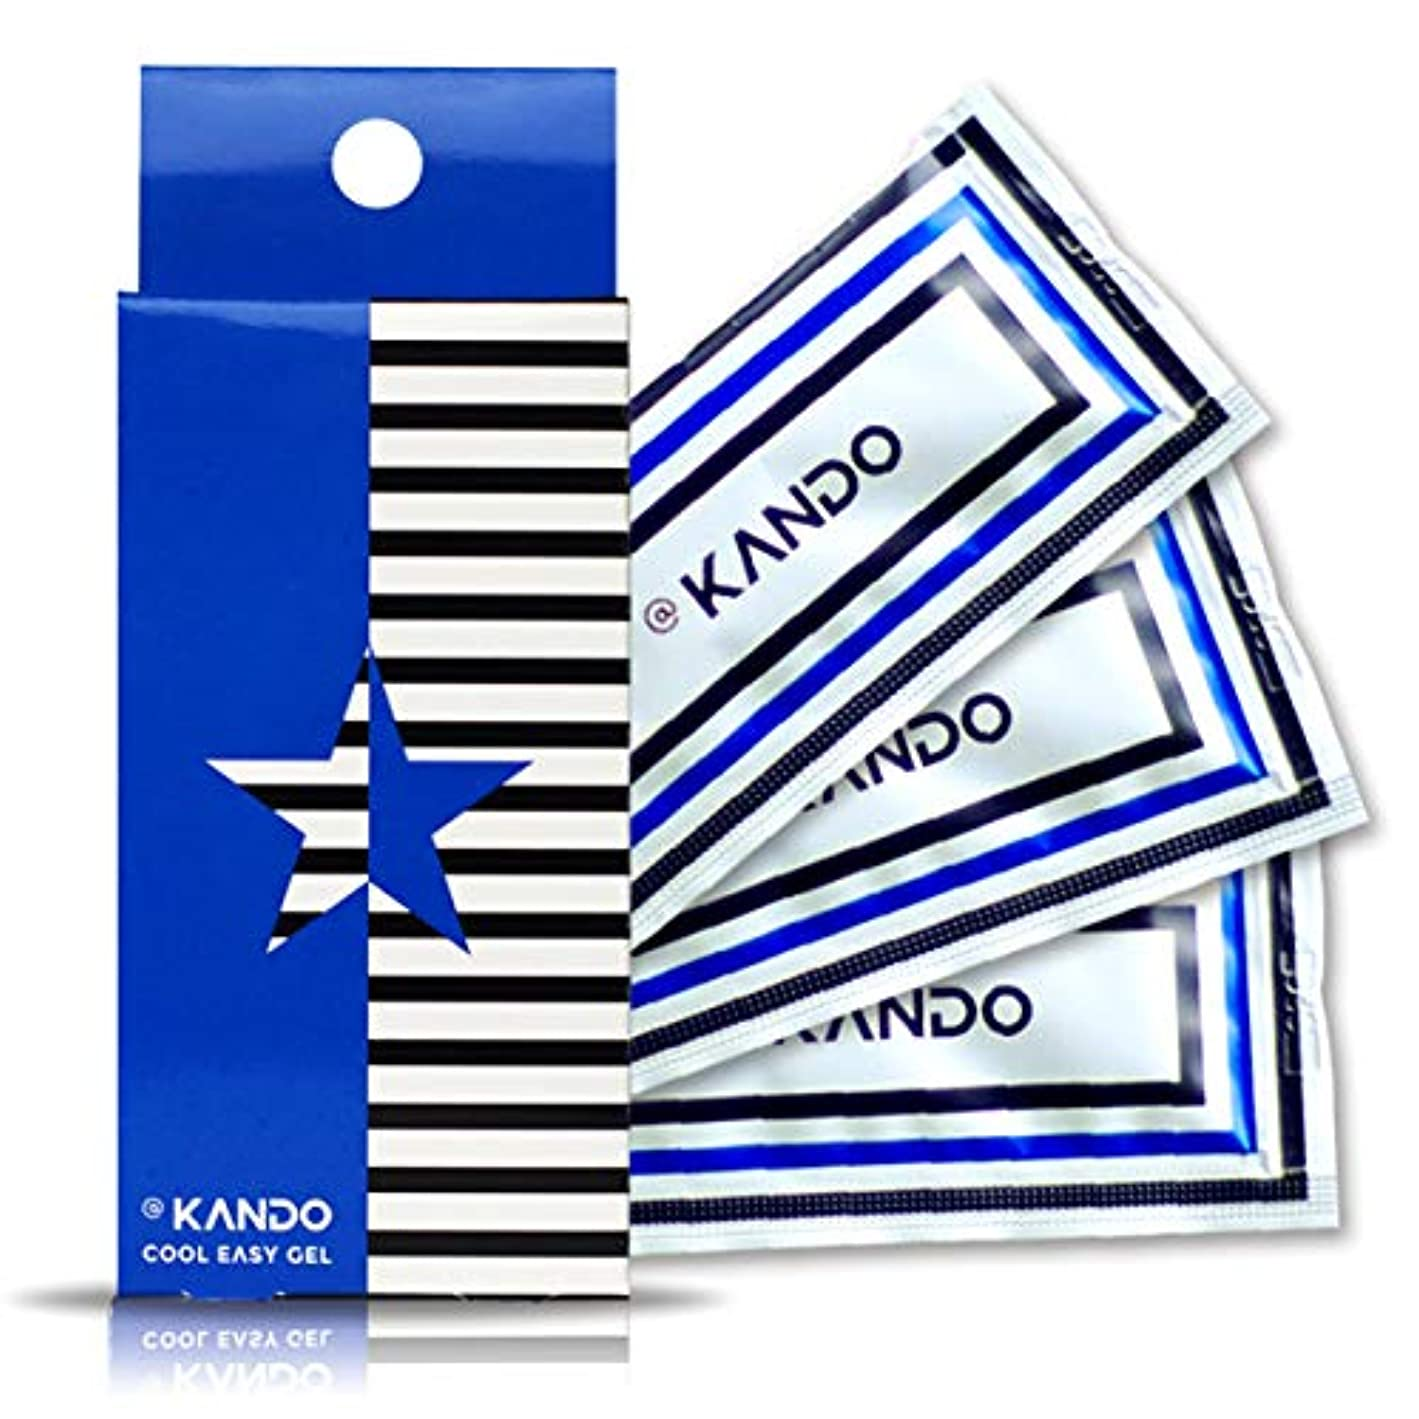 @KANDO アットカンドクールイージージェル(ボディマッサージジェル)5g×3包入 冷感タイプ